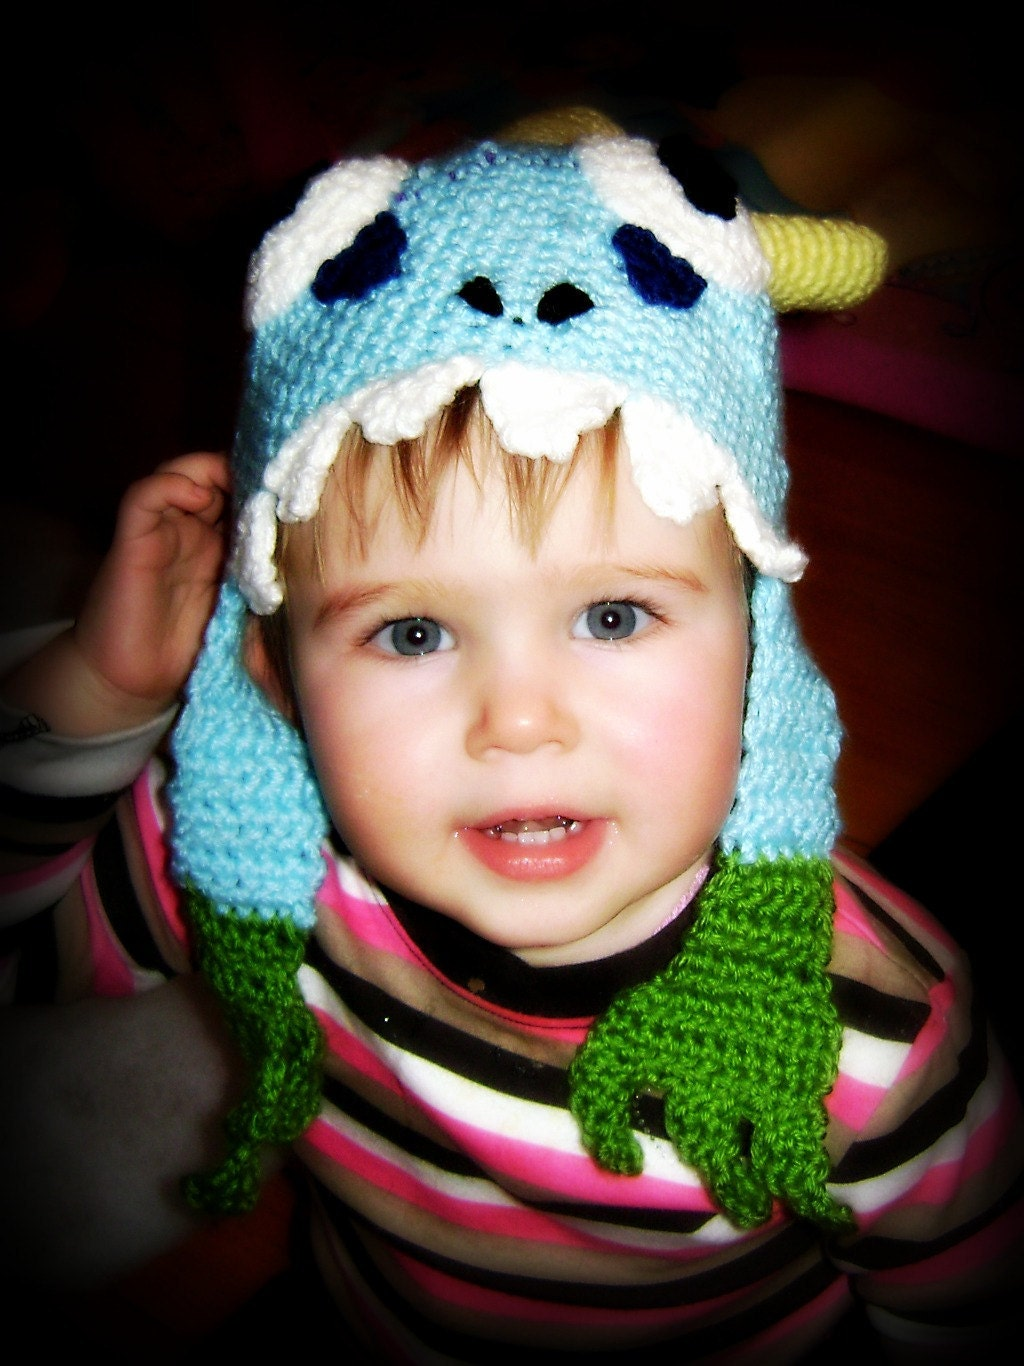 Crochet Hat Pattern Teenager : PDF Pattern Wow murloc crochet hat for toddler to teen world